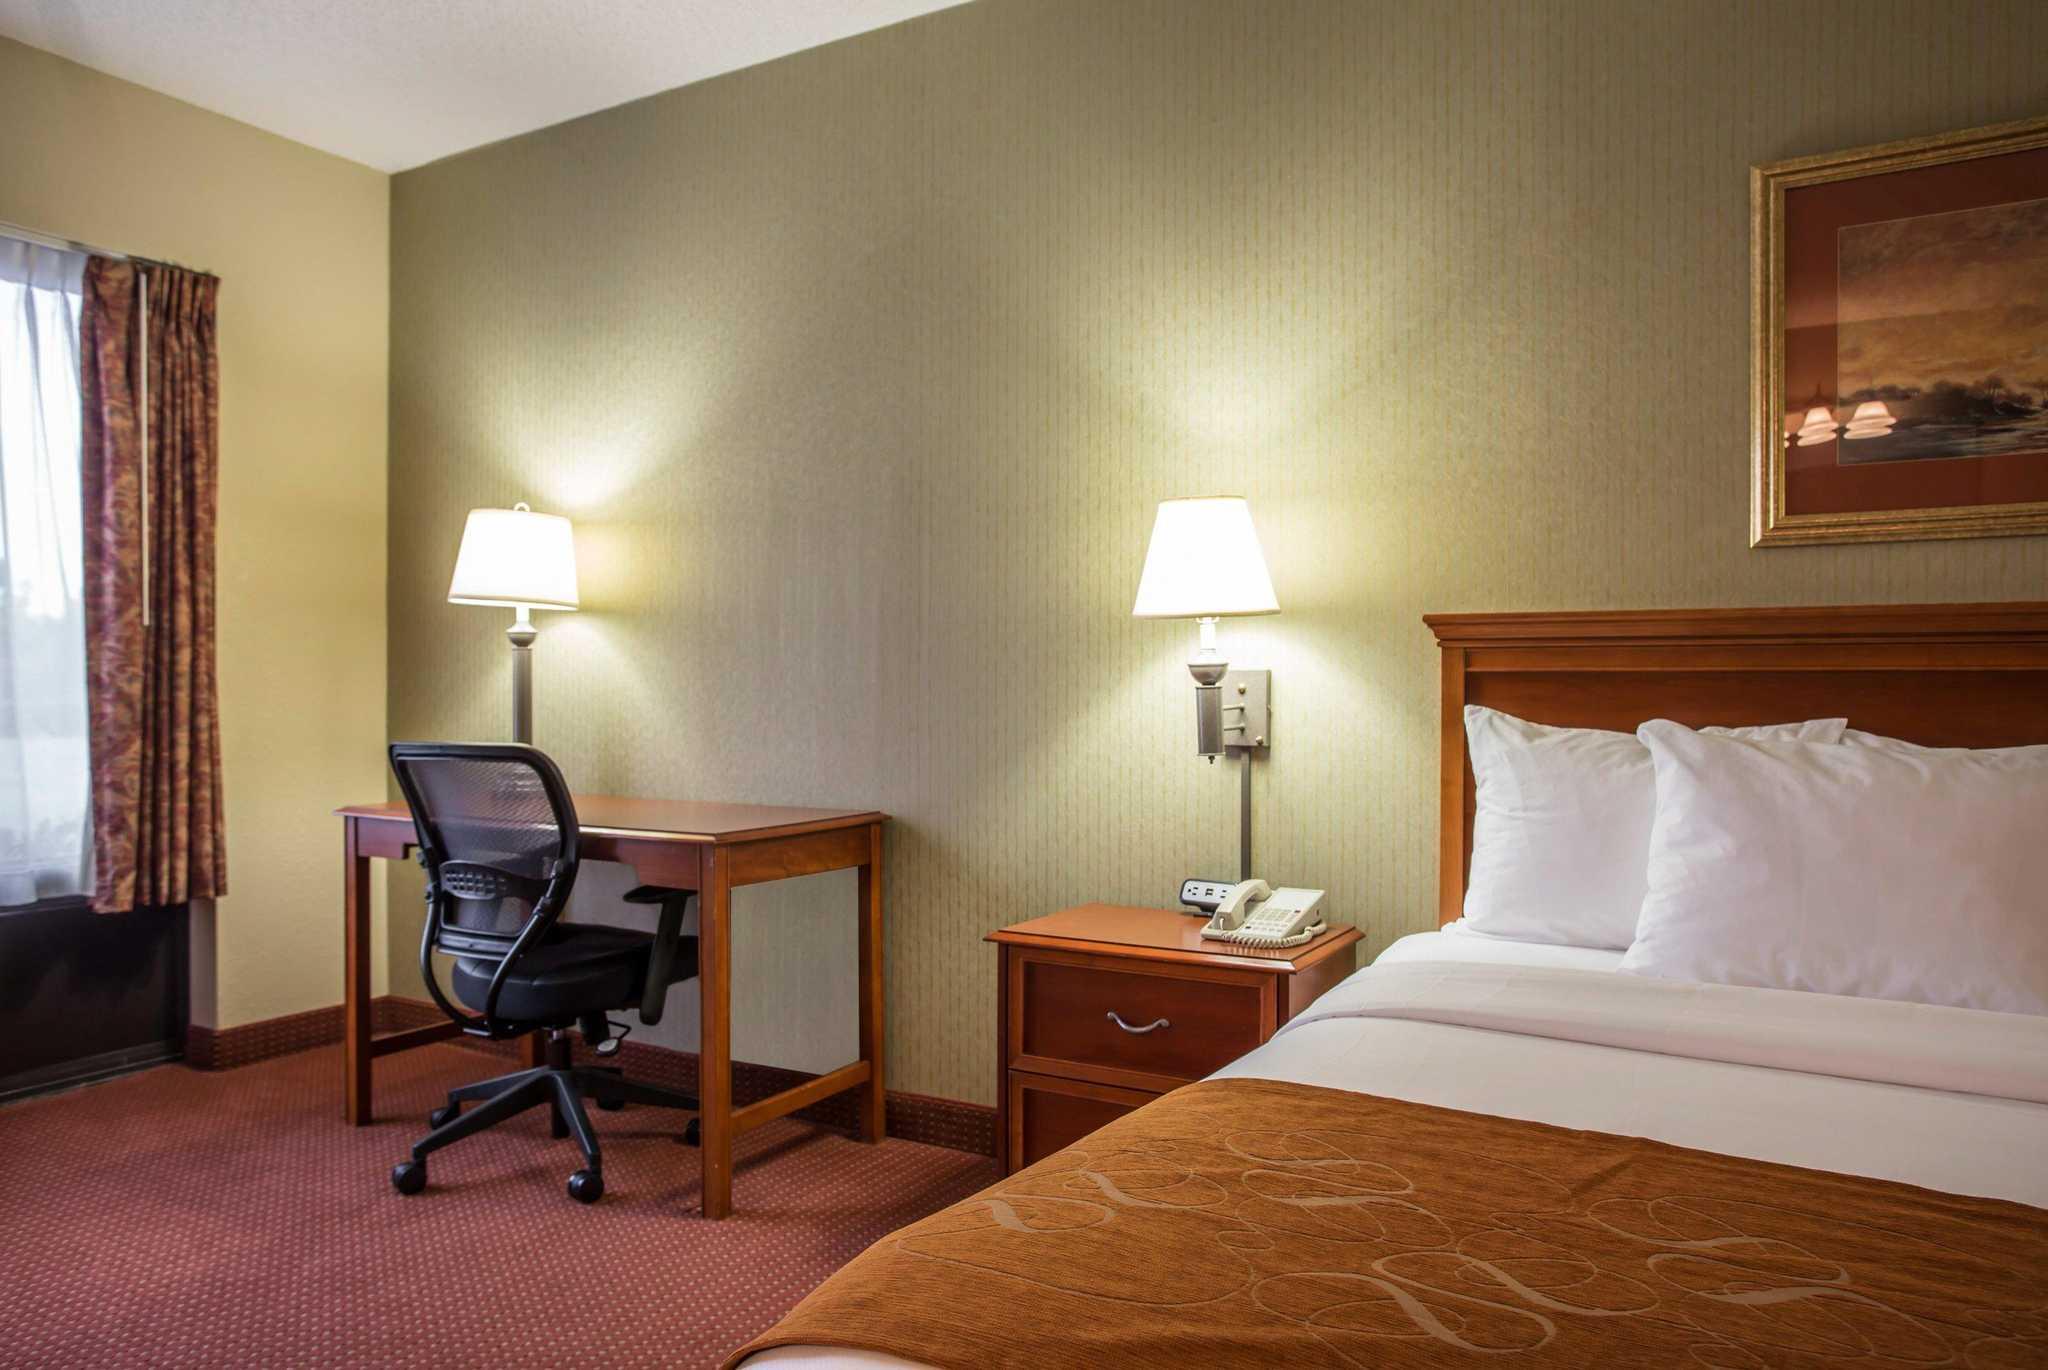 Comfort Suites Northlake image 18